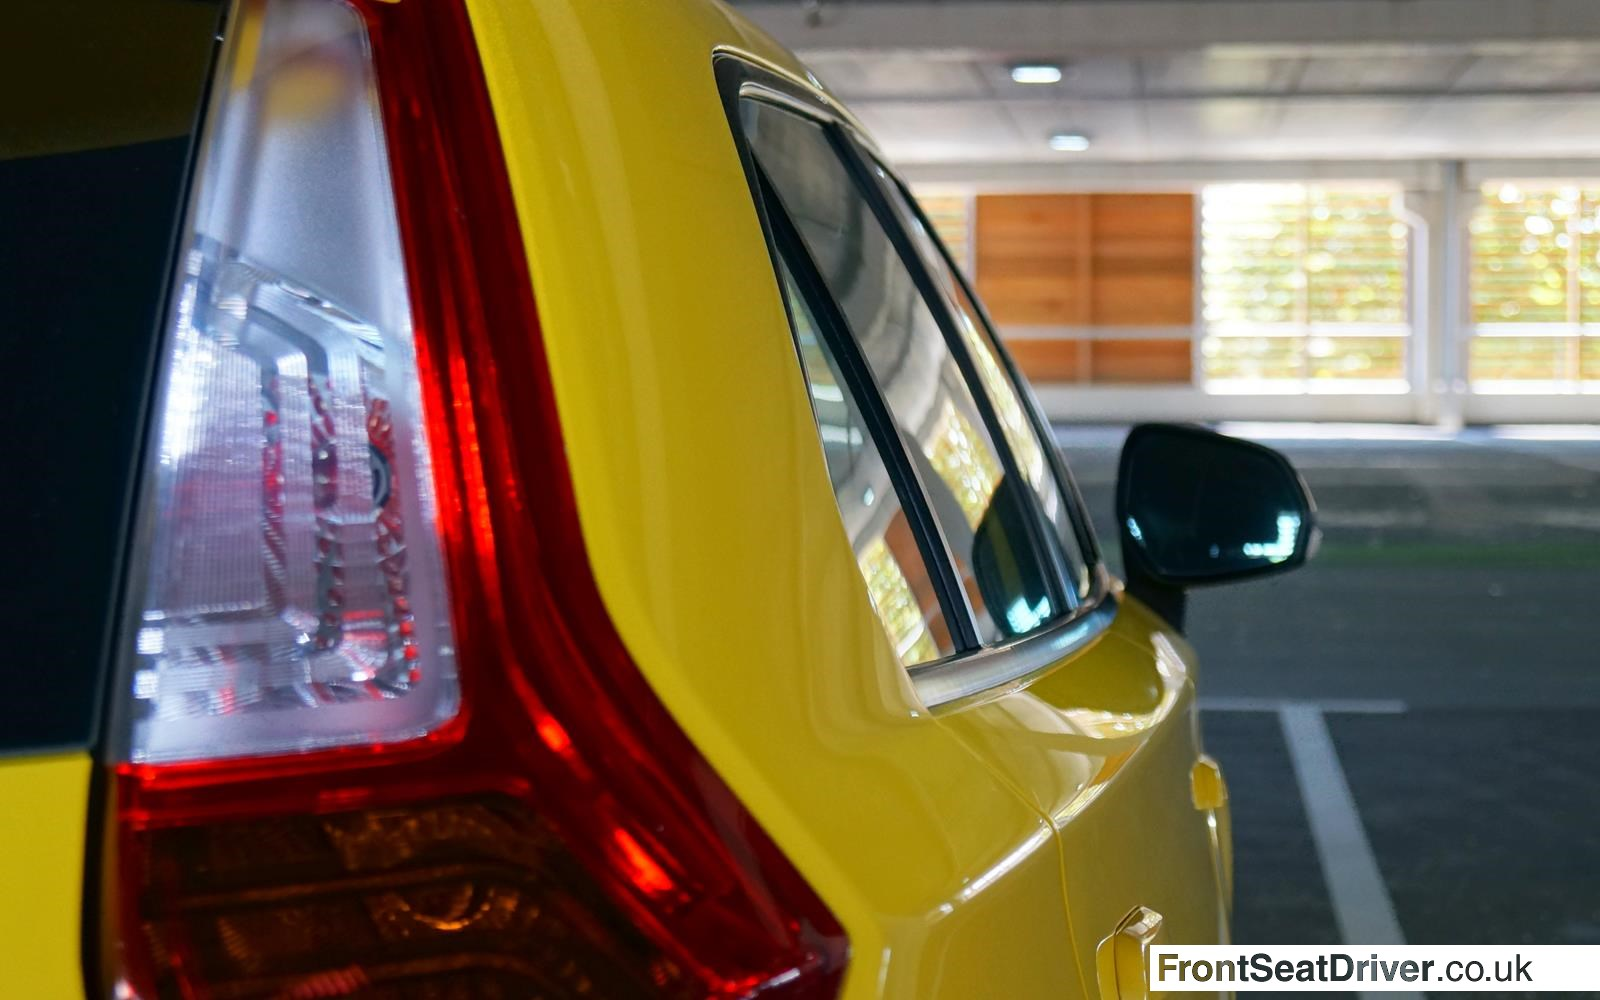 MG 3 2014 Rear Light Detail Phil Huff FrontSeatDriver.co.uk